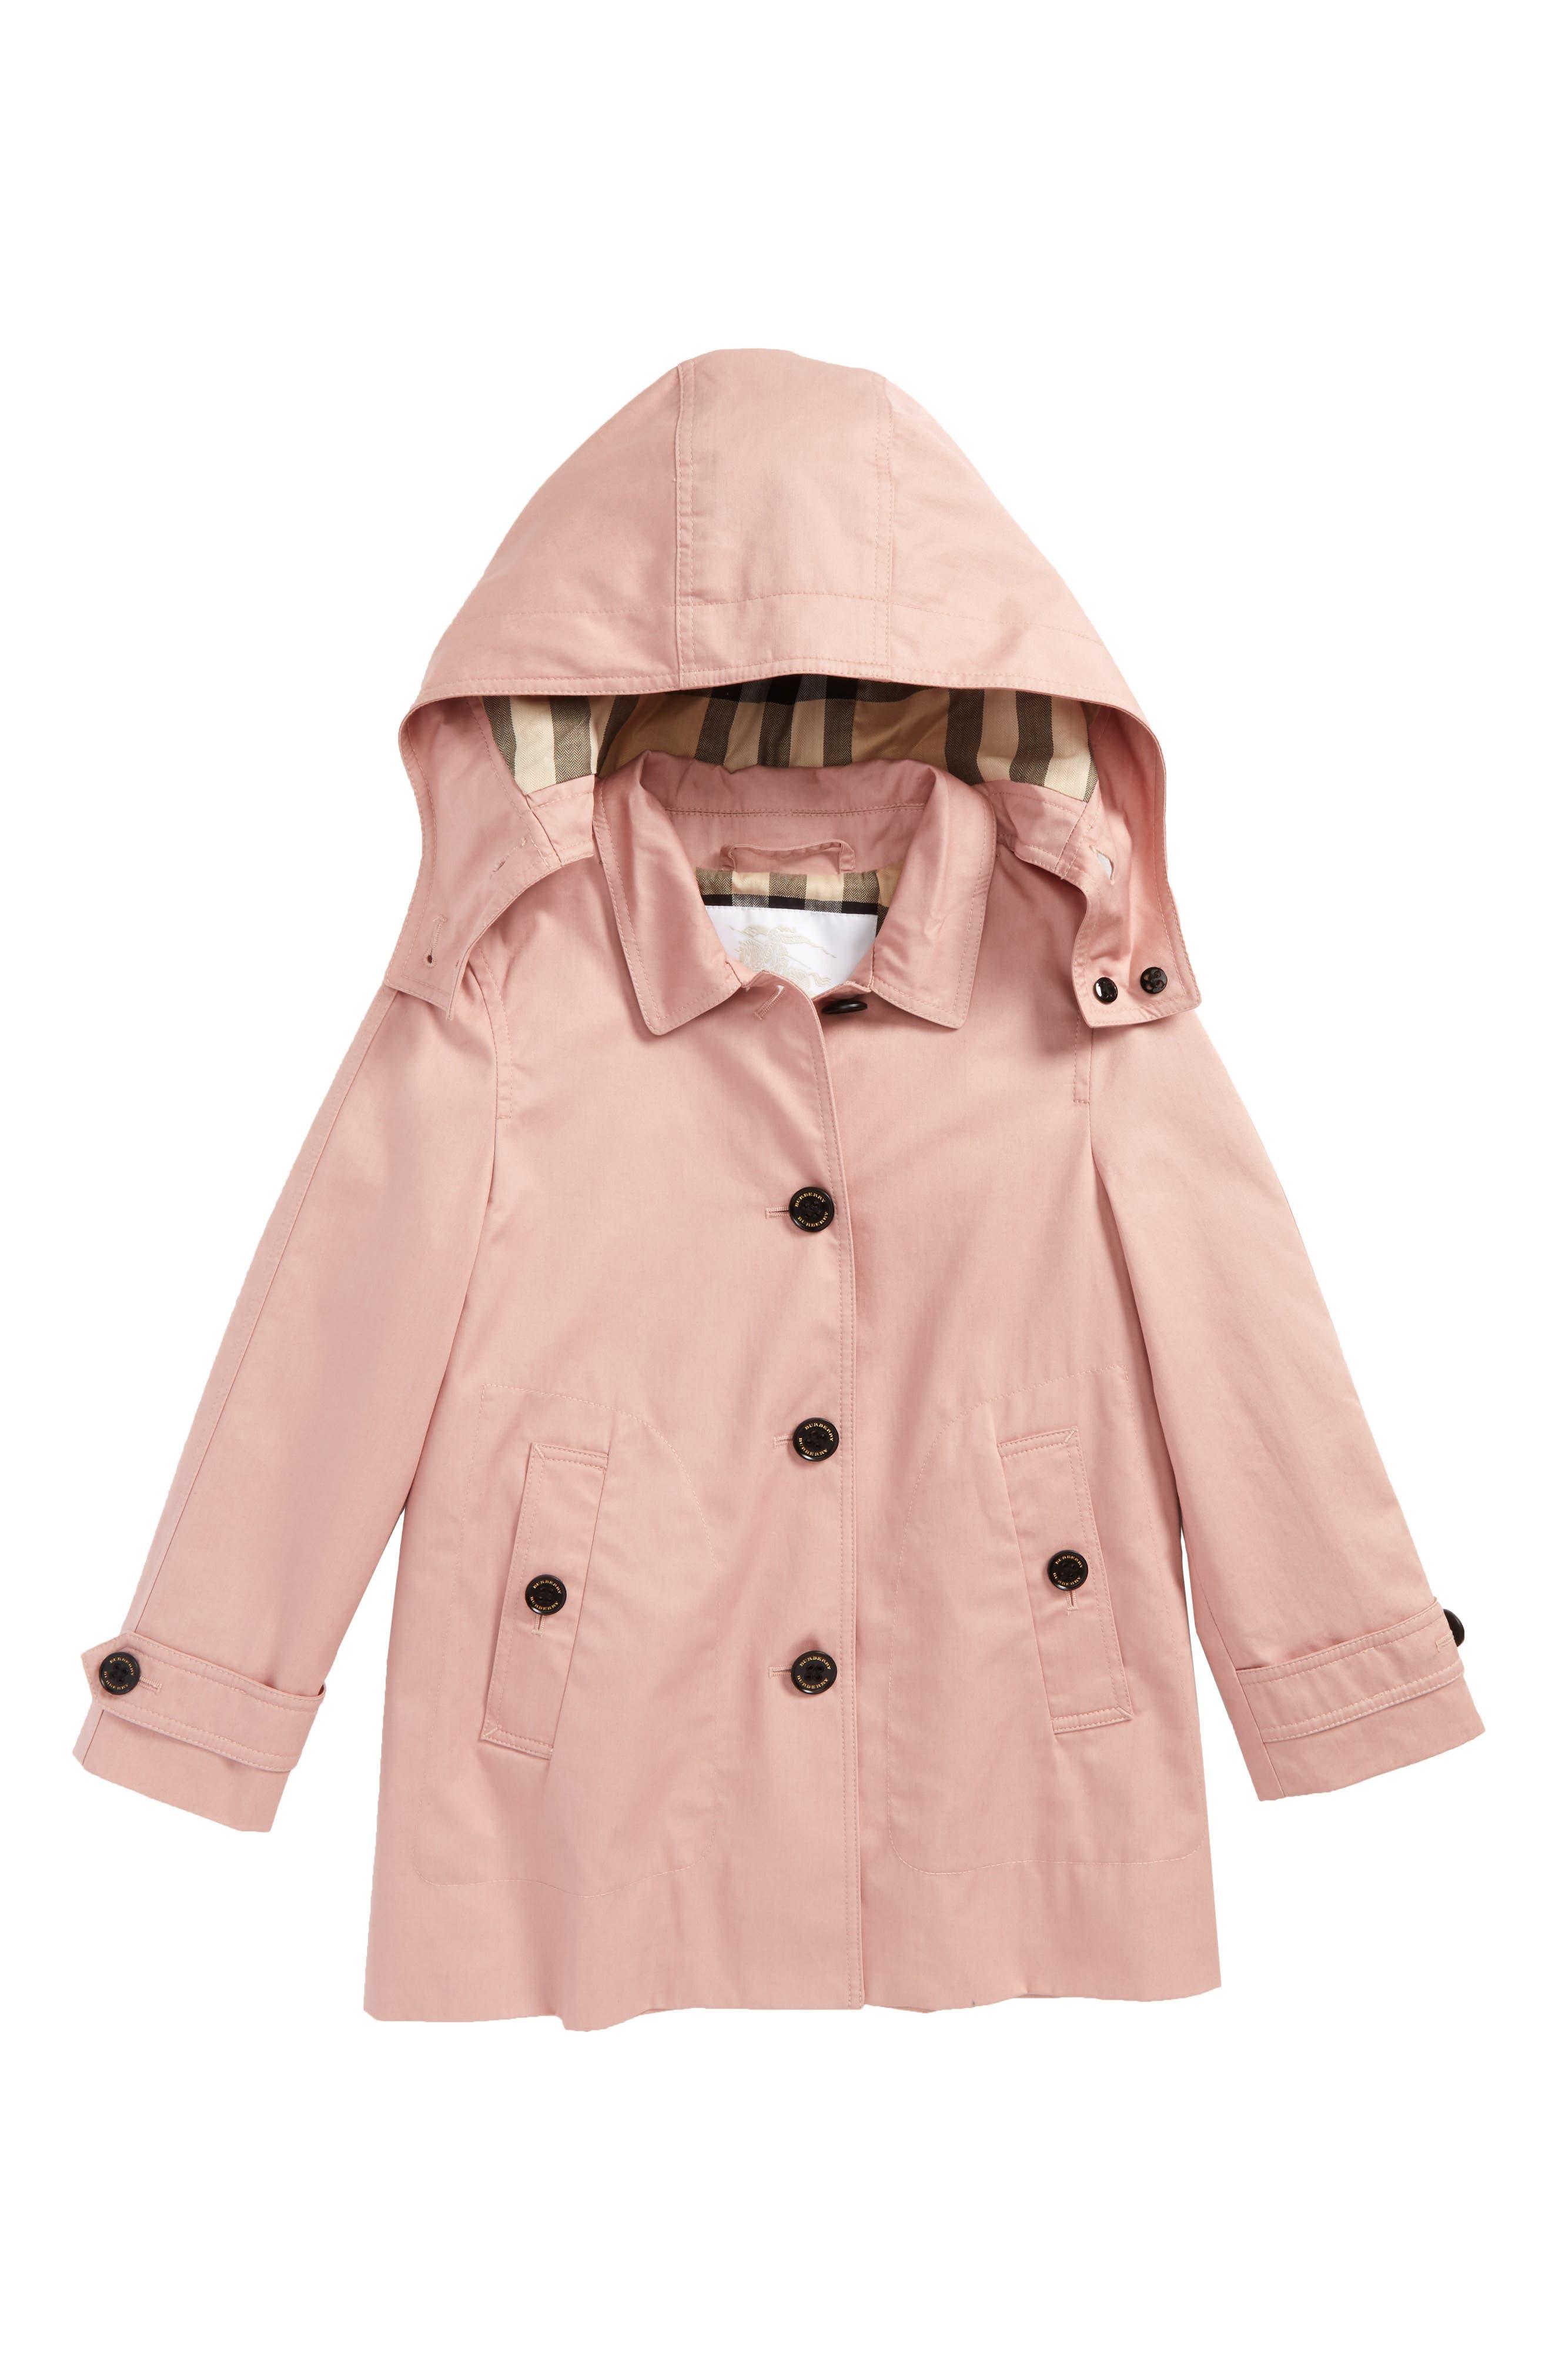 Main Image - Burberry Geri Hooded Trench Coat (Little Girls & Big Girls)